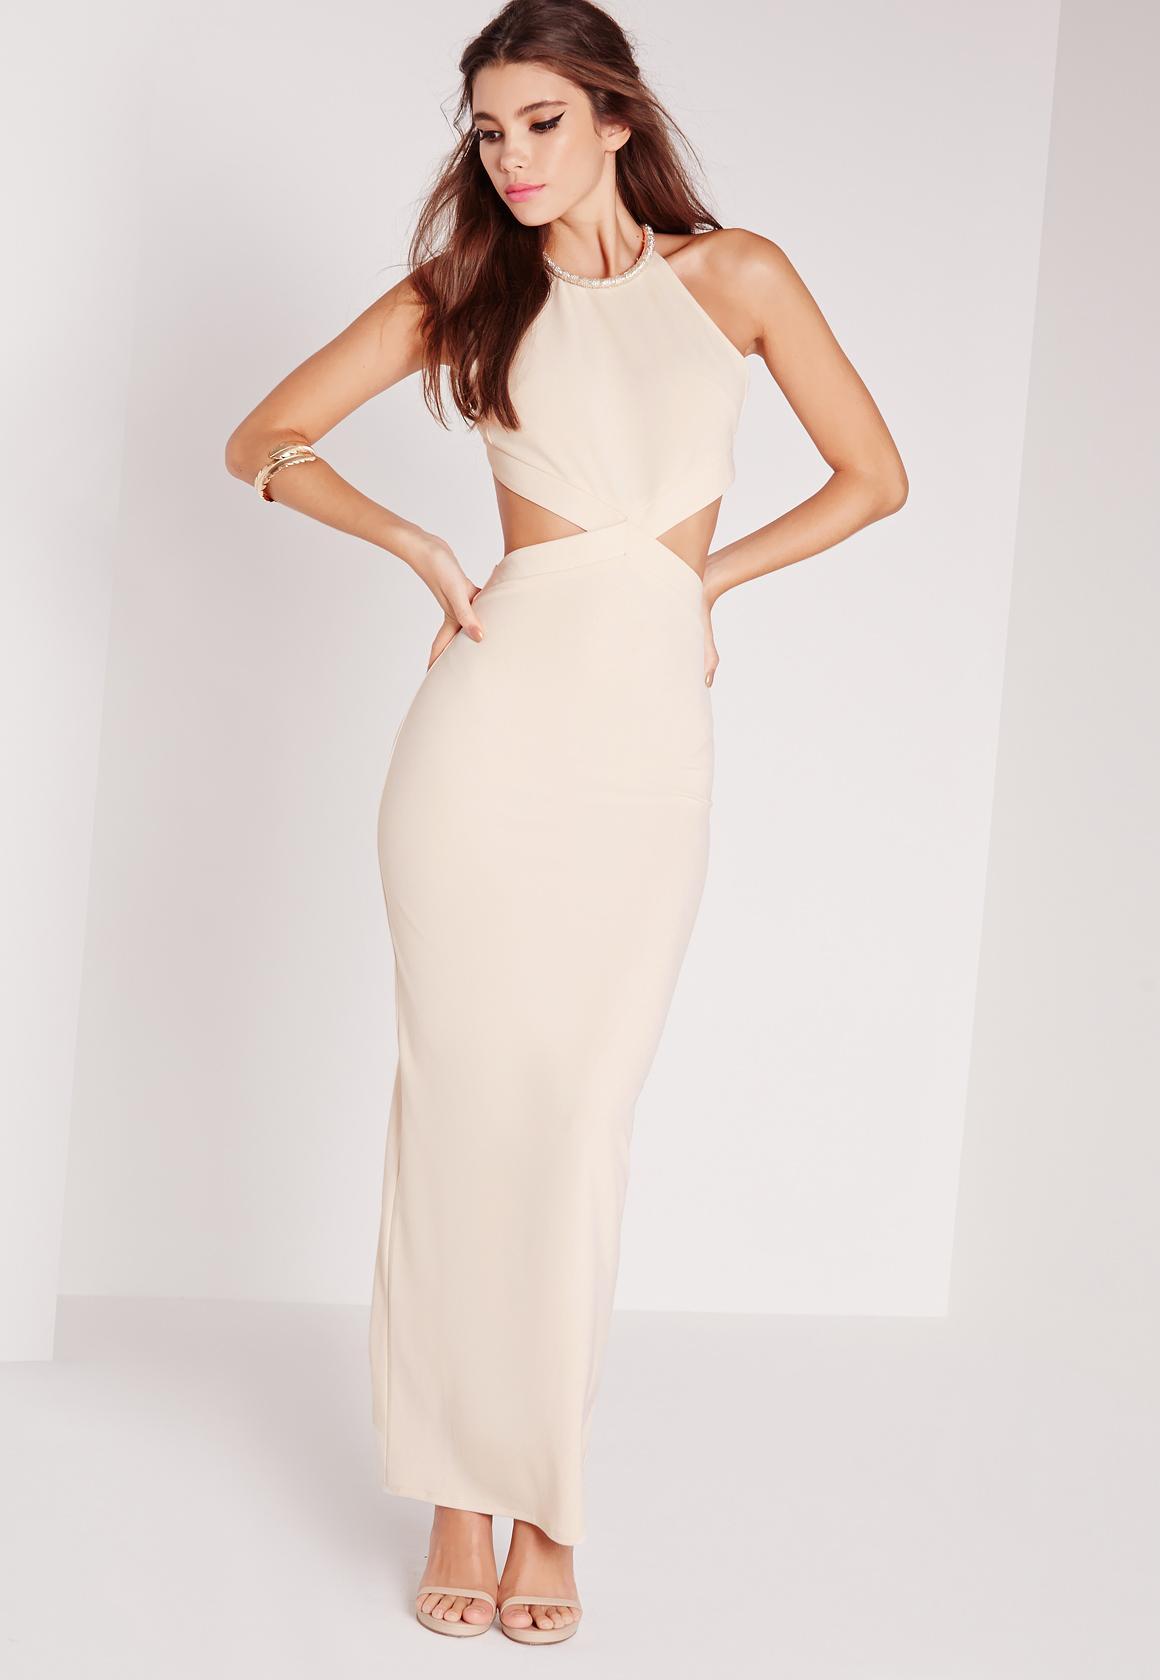 Cut Out Dresses, Cut Out Detail Dress | Missguided